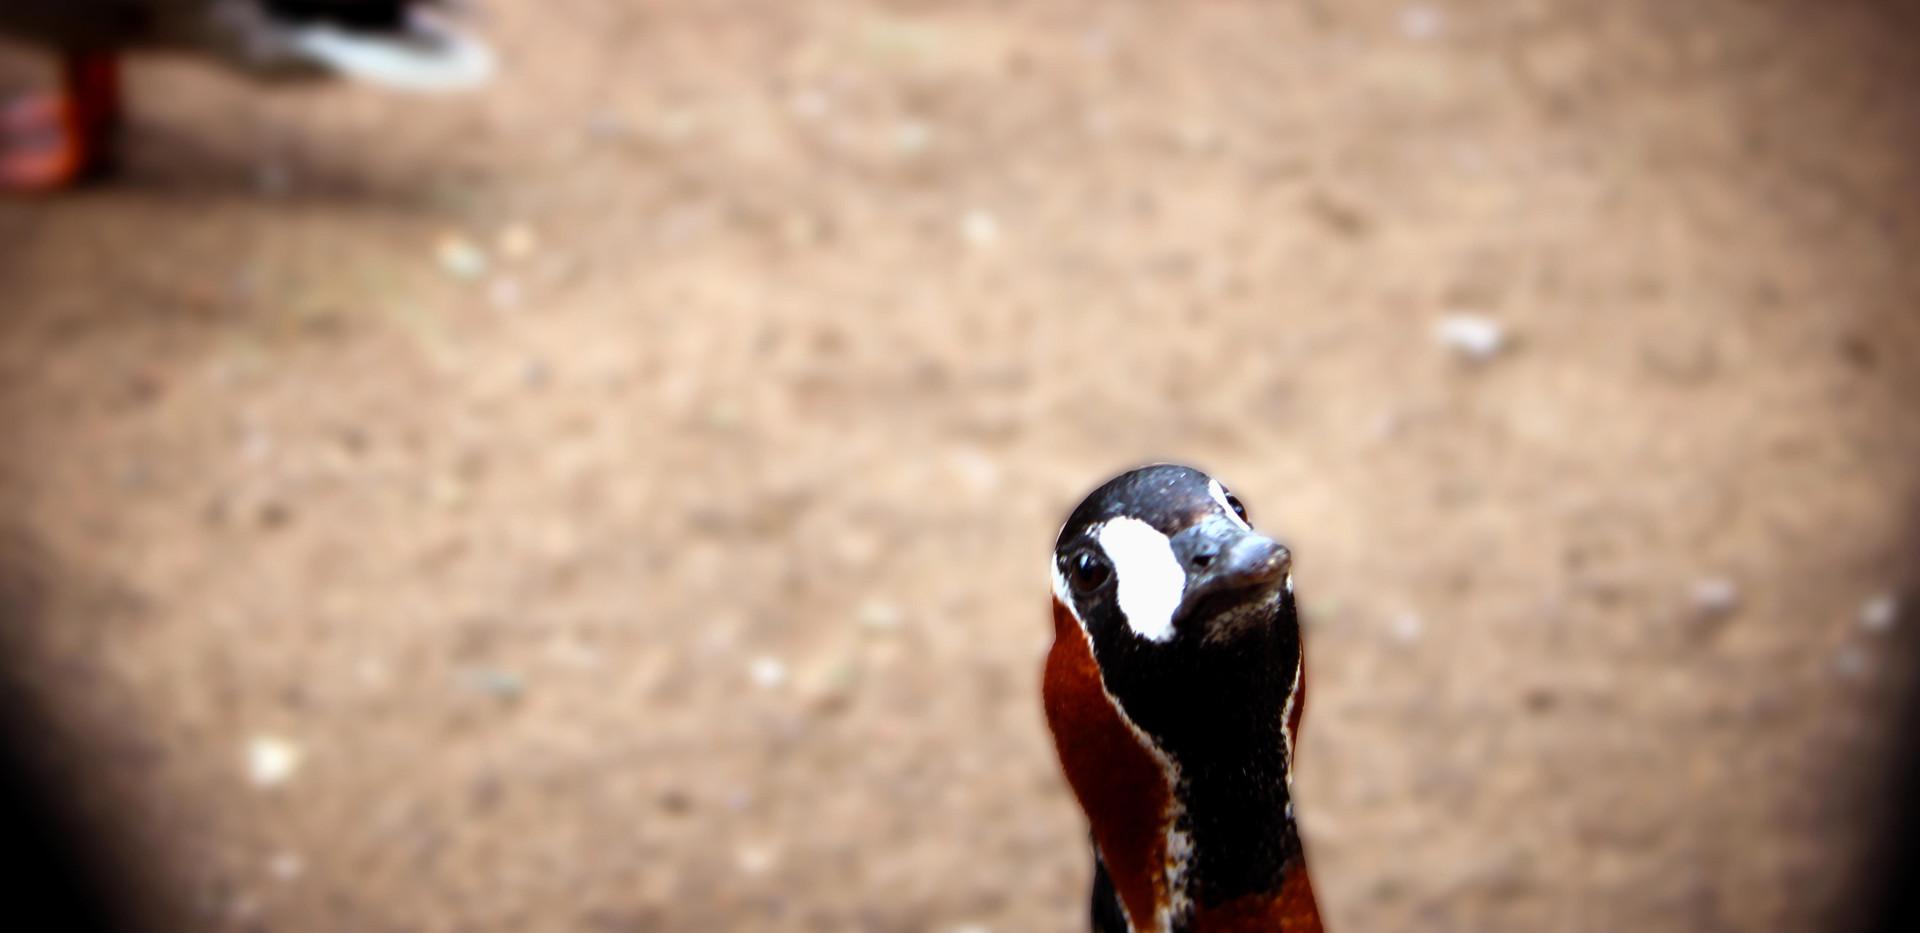 Duck in Green Park